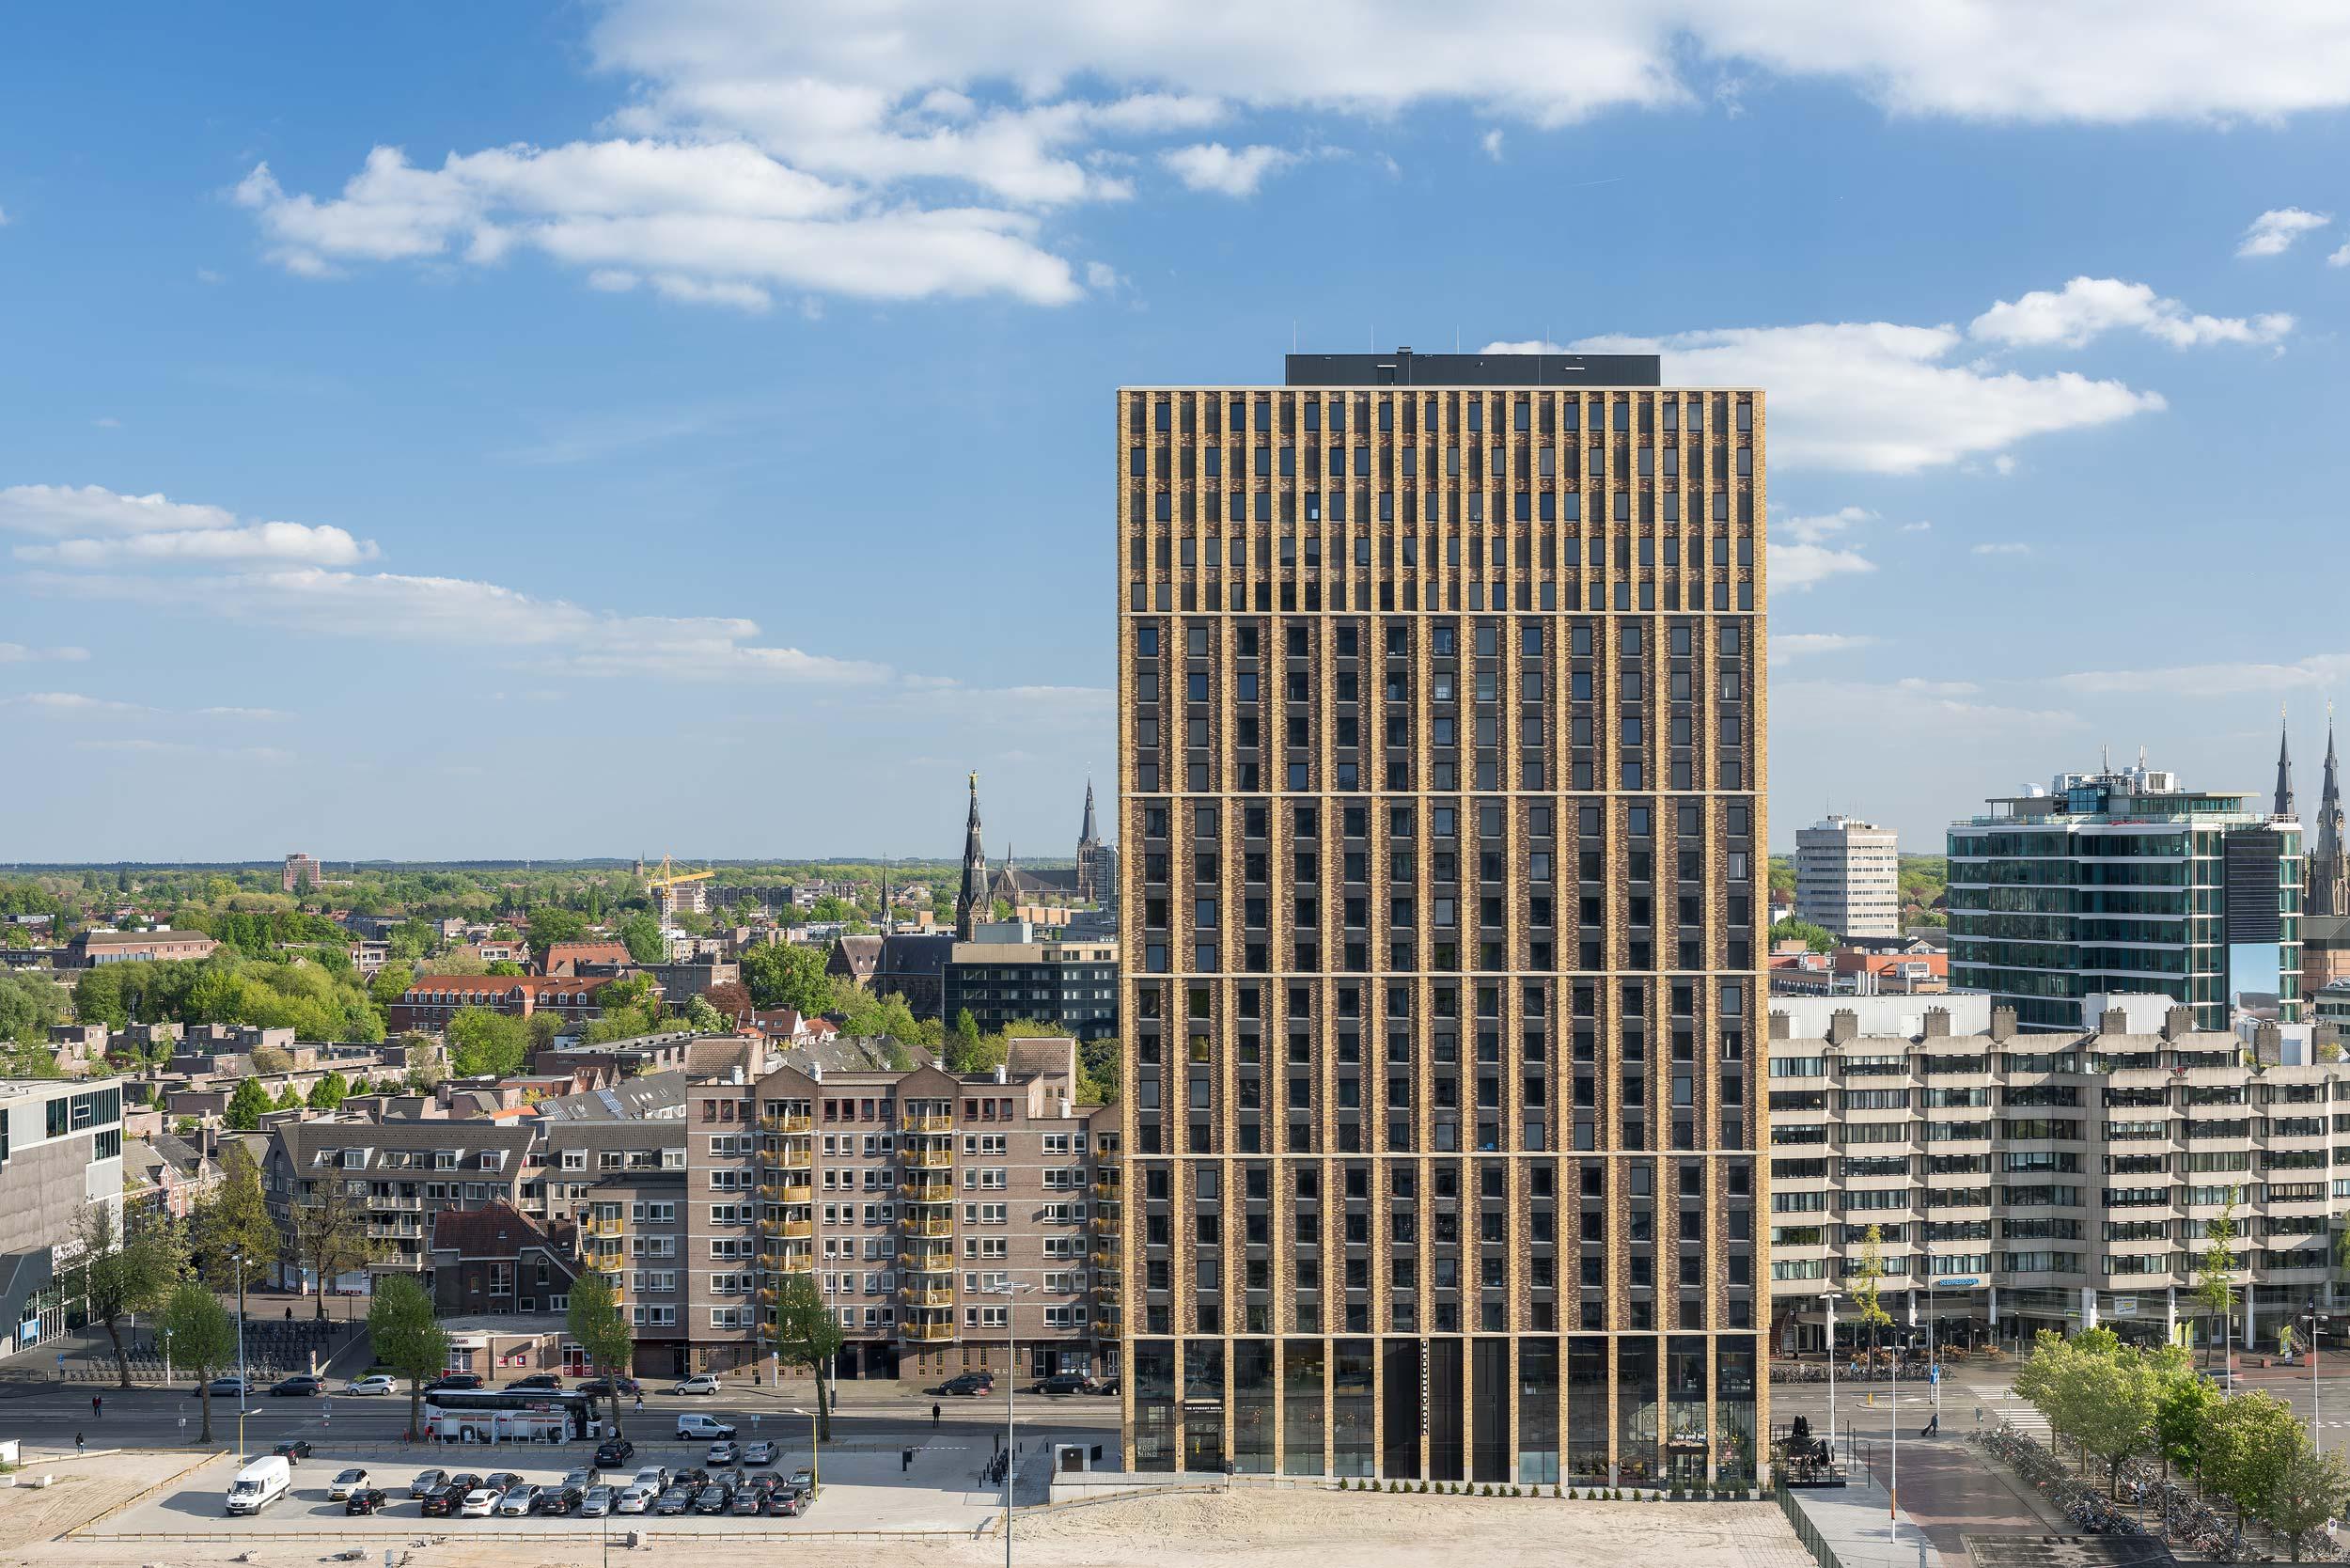 Student Hotel Eindhoven - Architectuur fotograaf Chiel de Nooyer